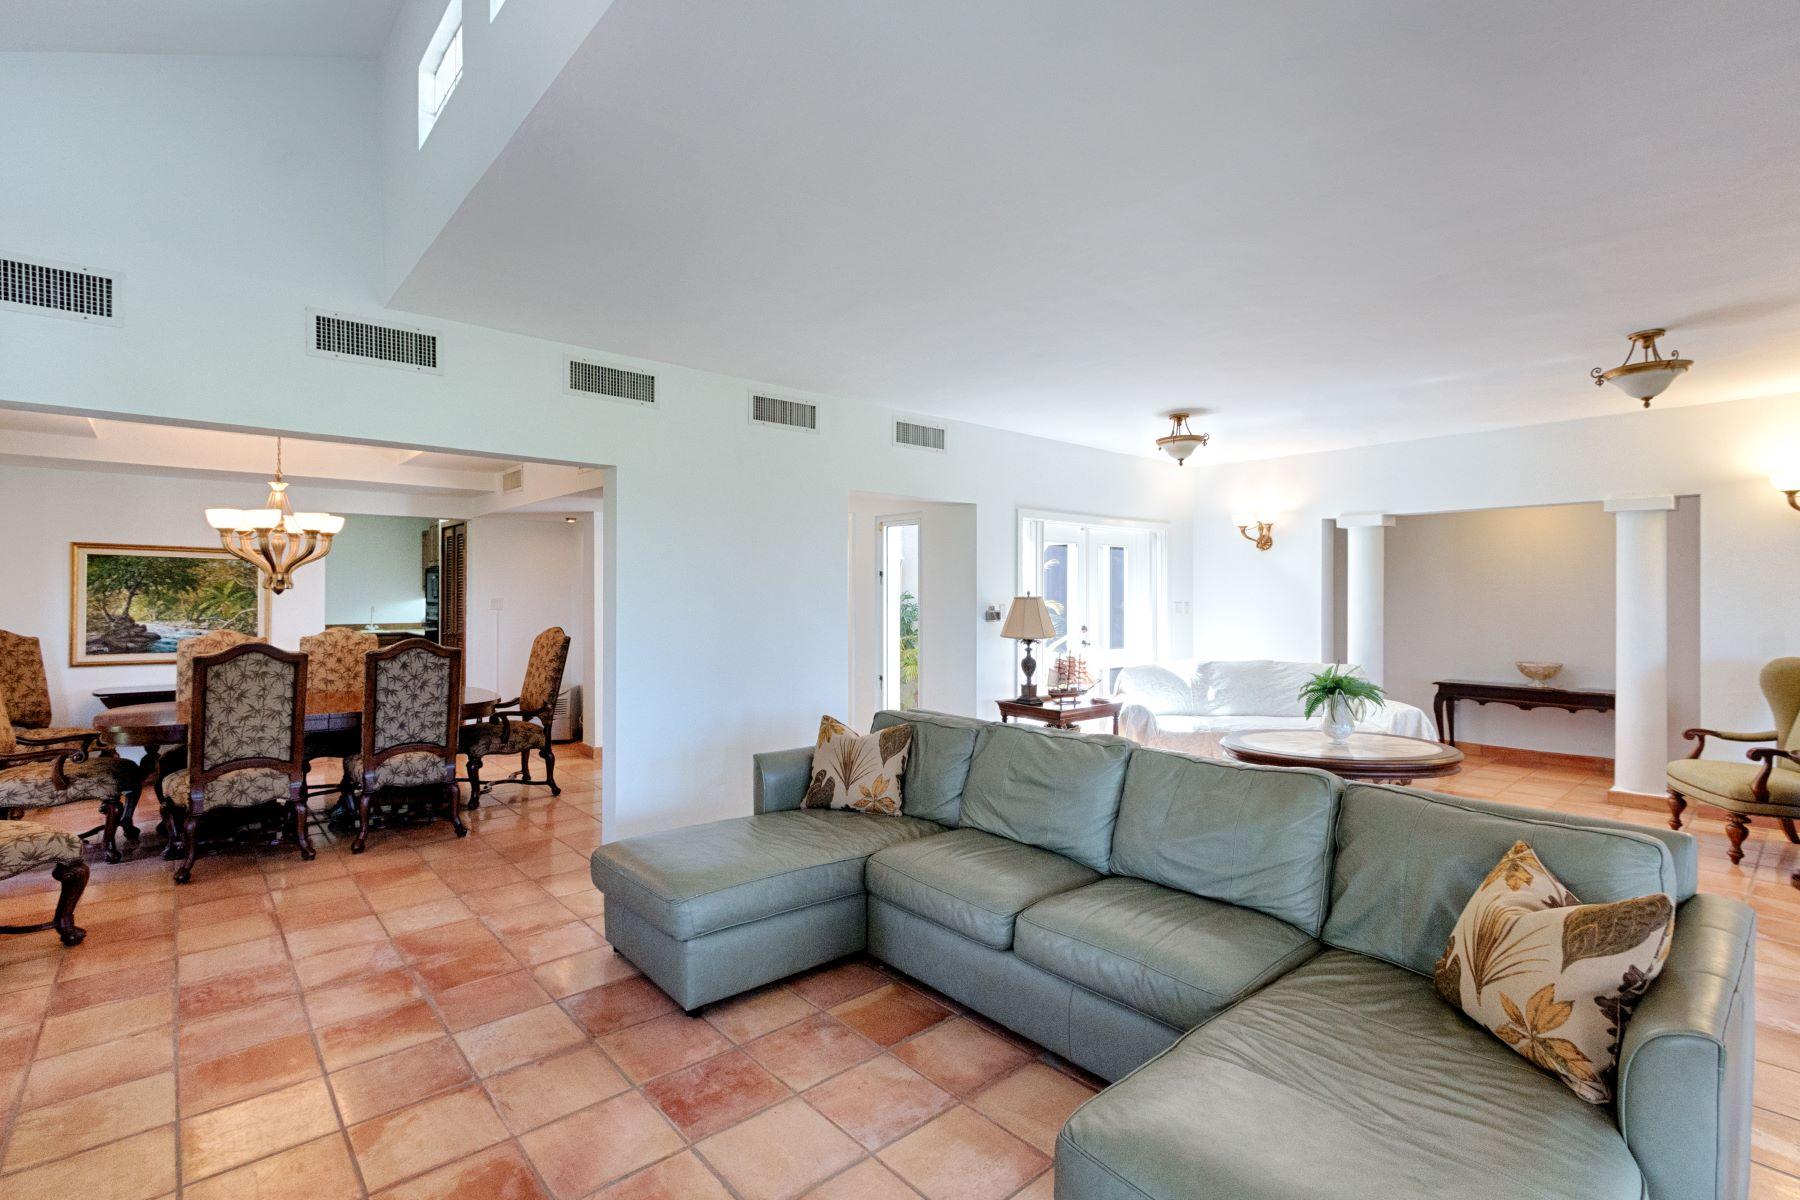 Additional photo for property listing at Perfect Caribbean Home 100 The Greens Villas Drive, Villa 2 Dorado Beach, 00646 Puerto Rico